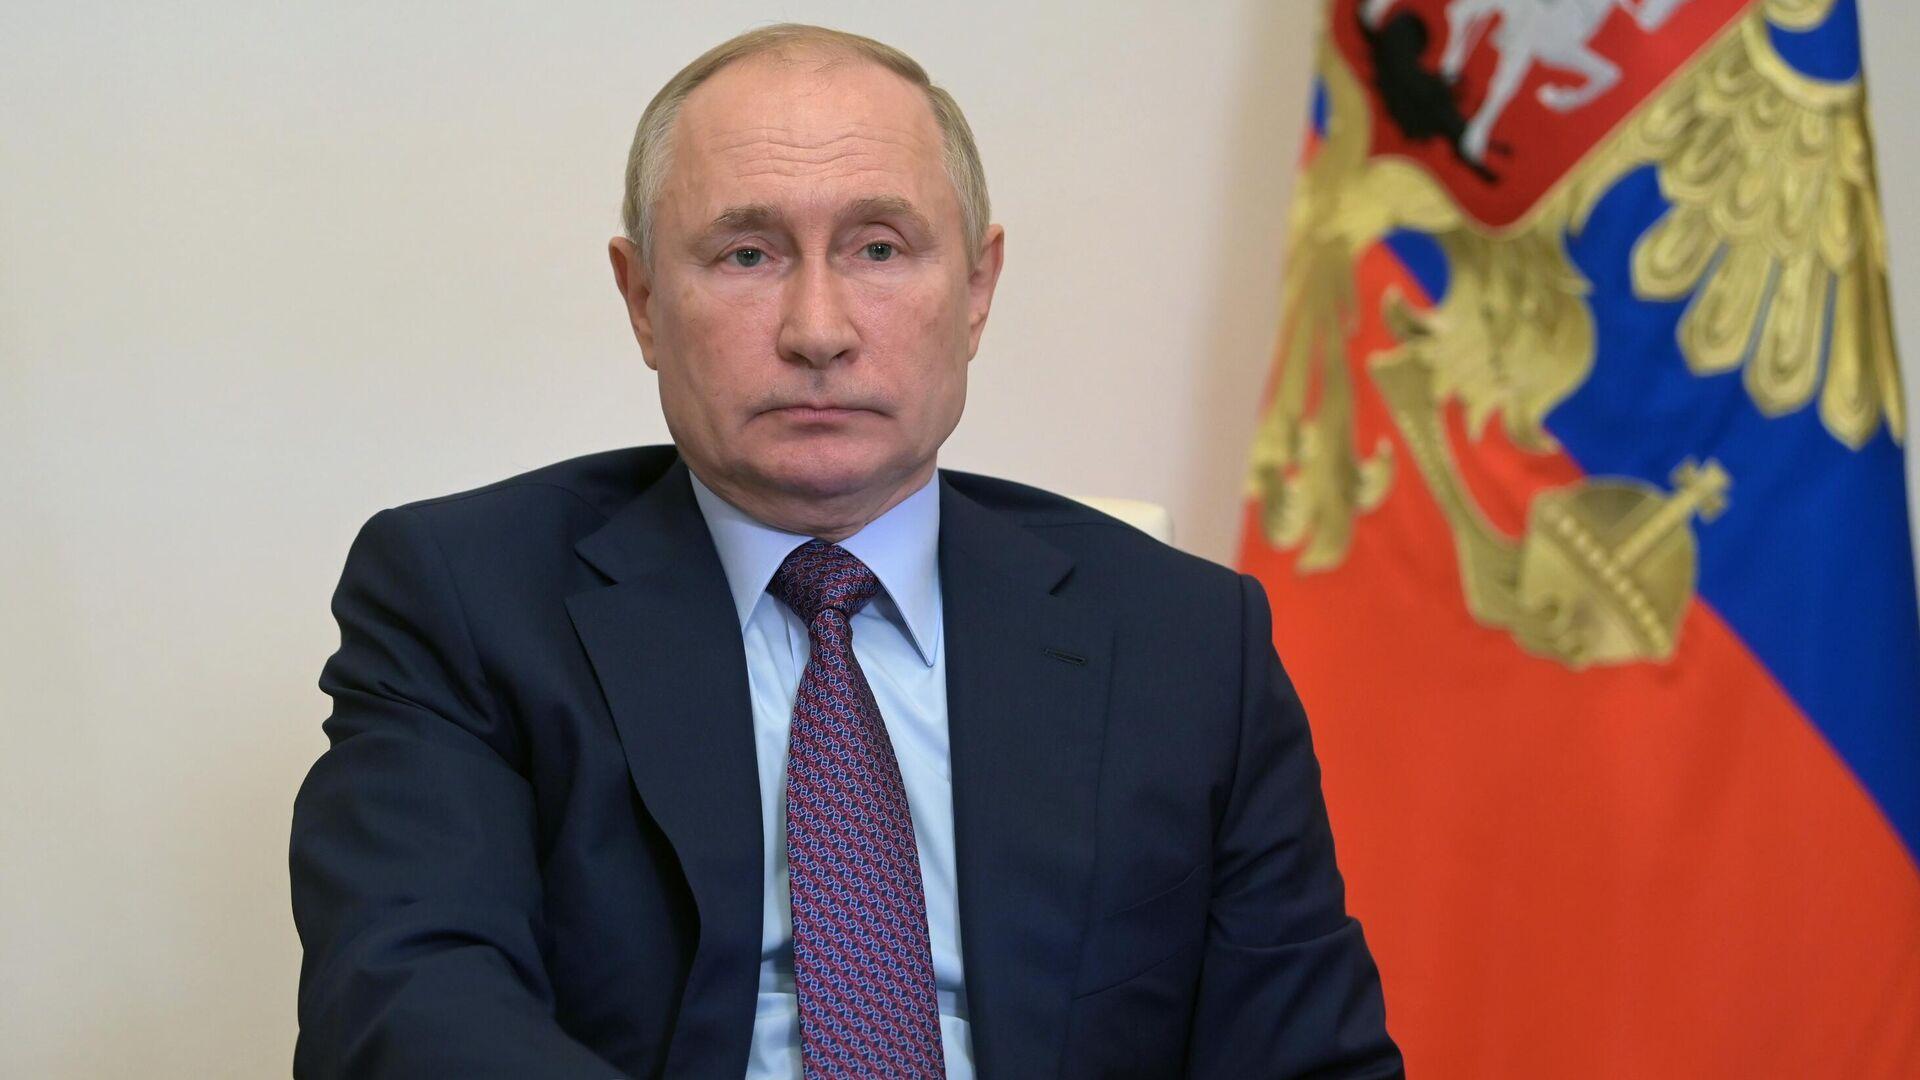 Vladímir Putin, presidente de Rusia - Sputnik Mundo, 1920, 06.10.2021